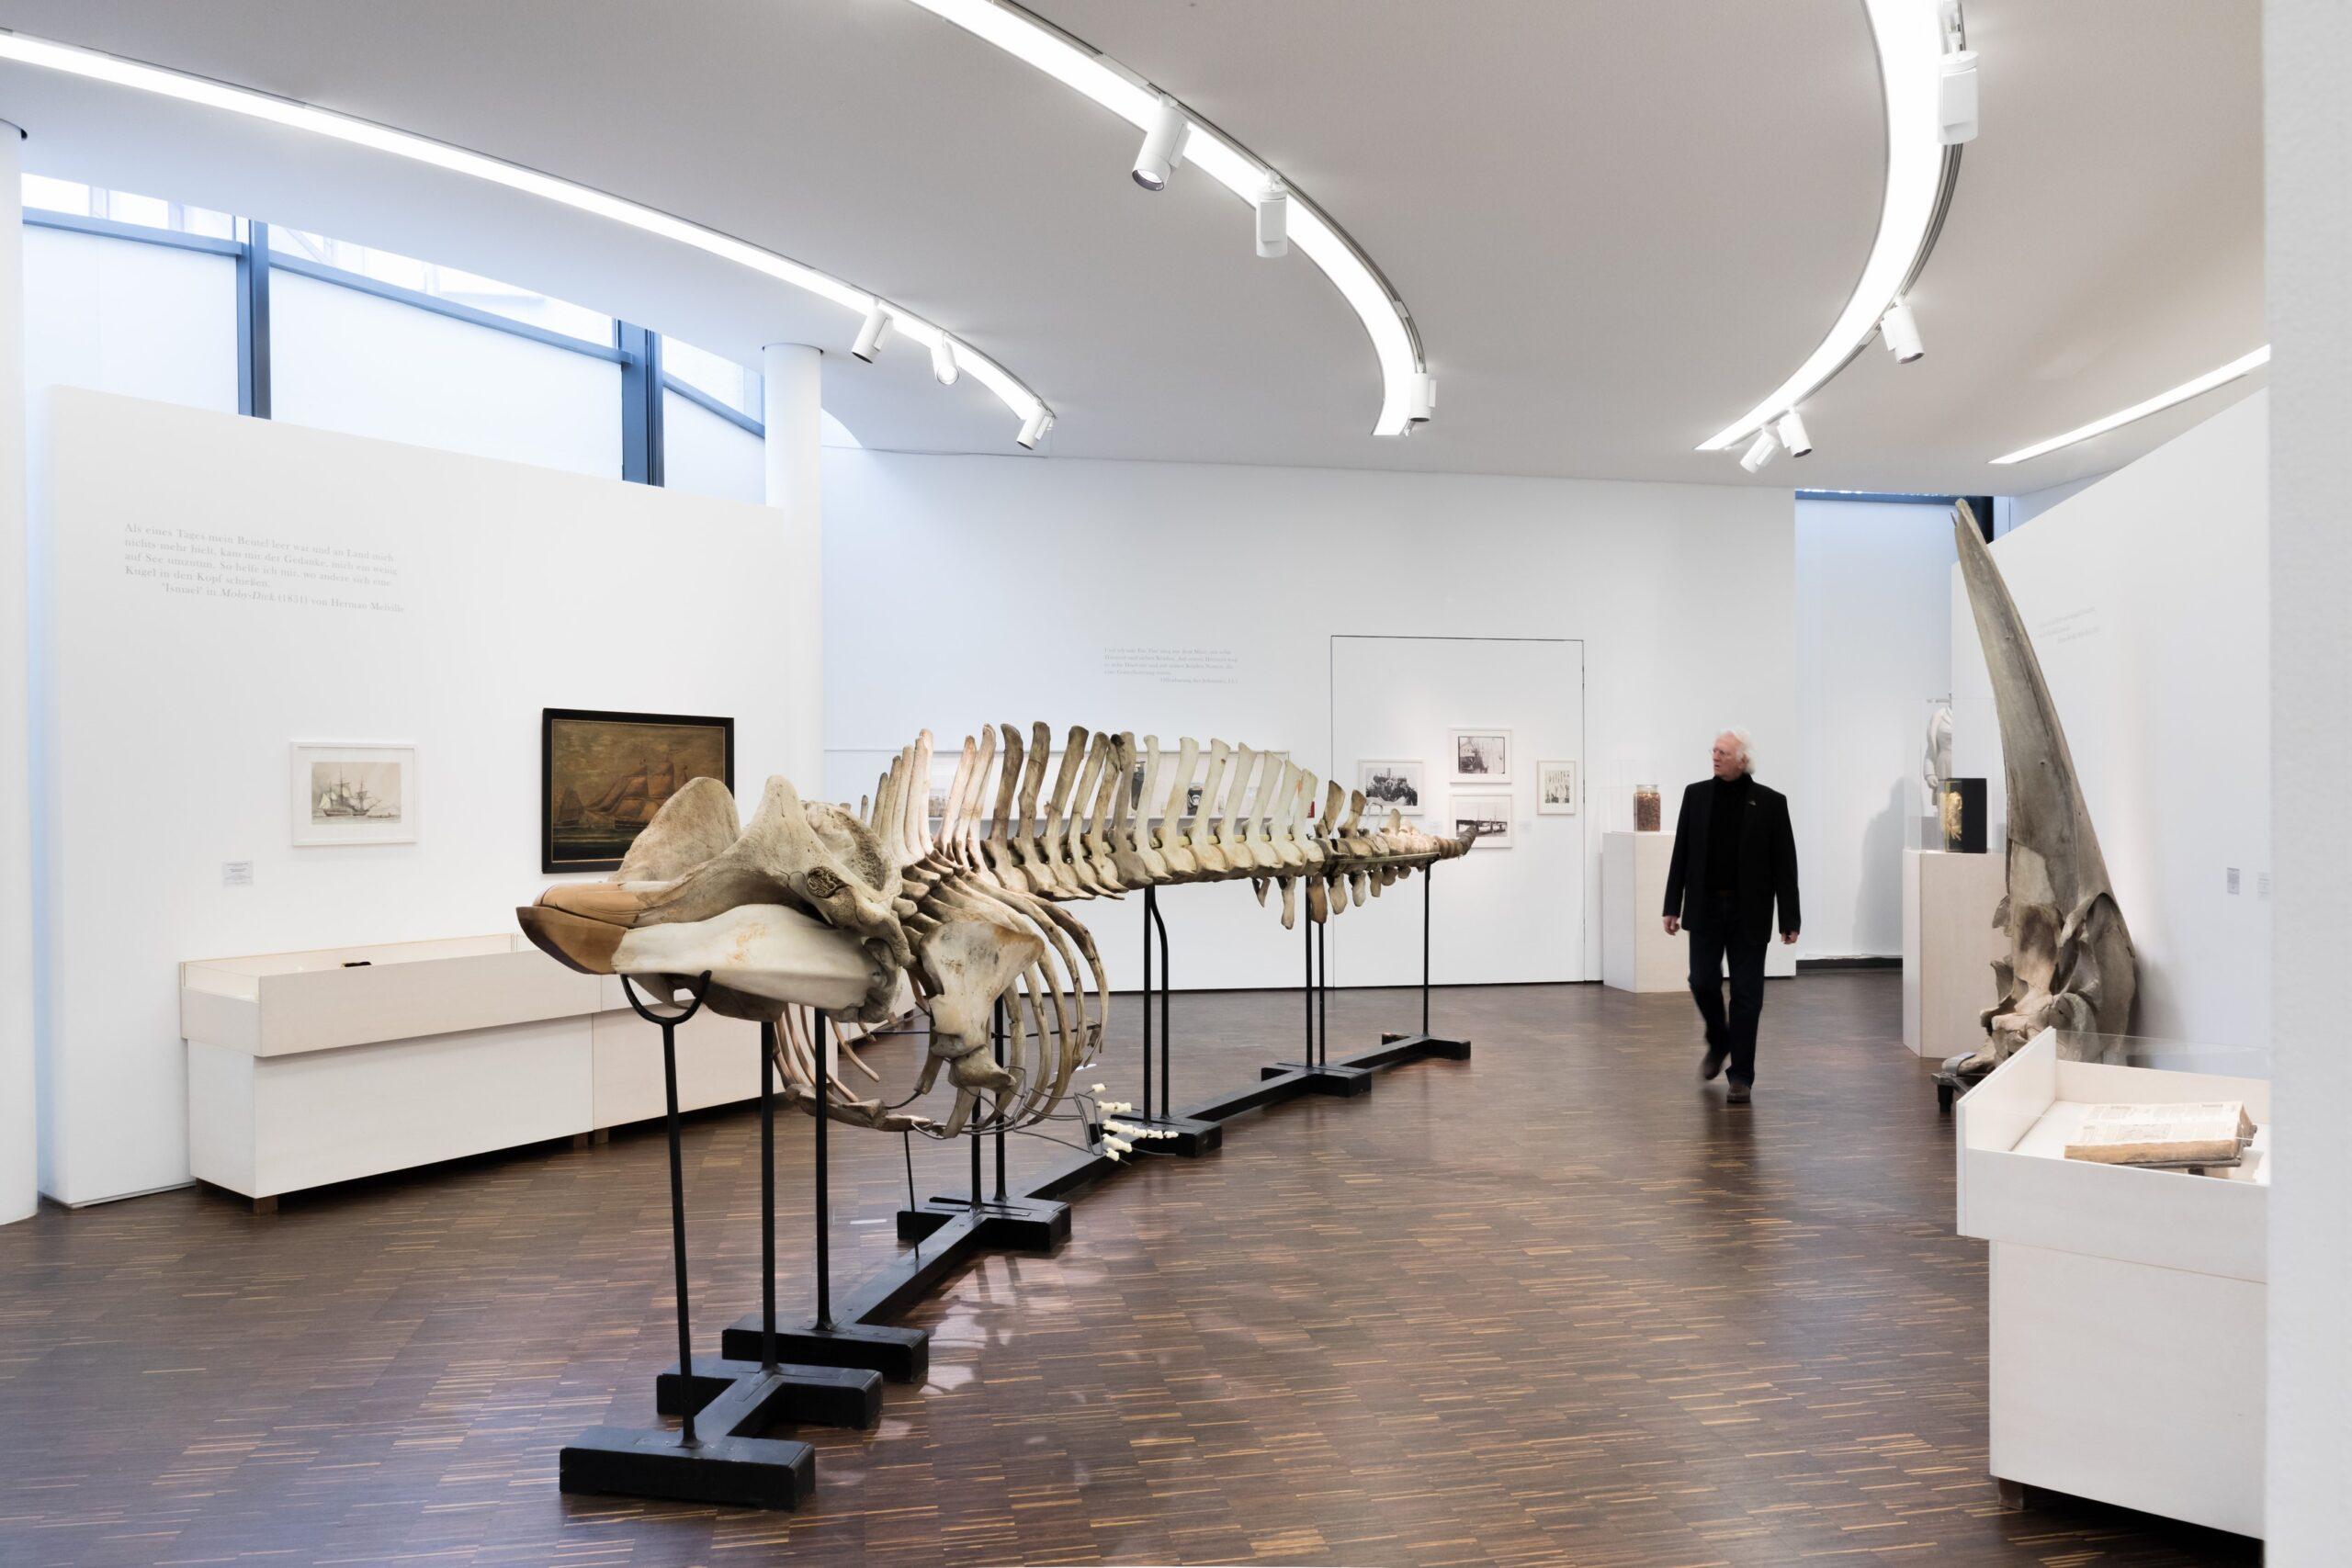 Museum La8 Hohesee Walskelett Besucher F Jesse Kl